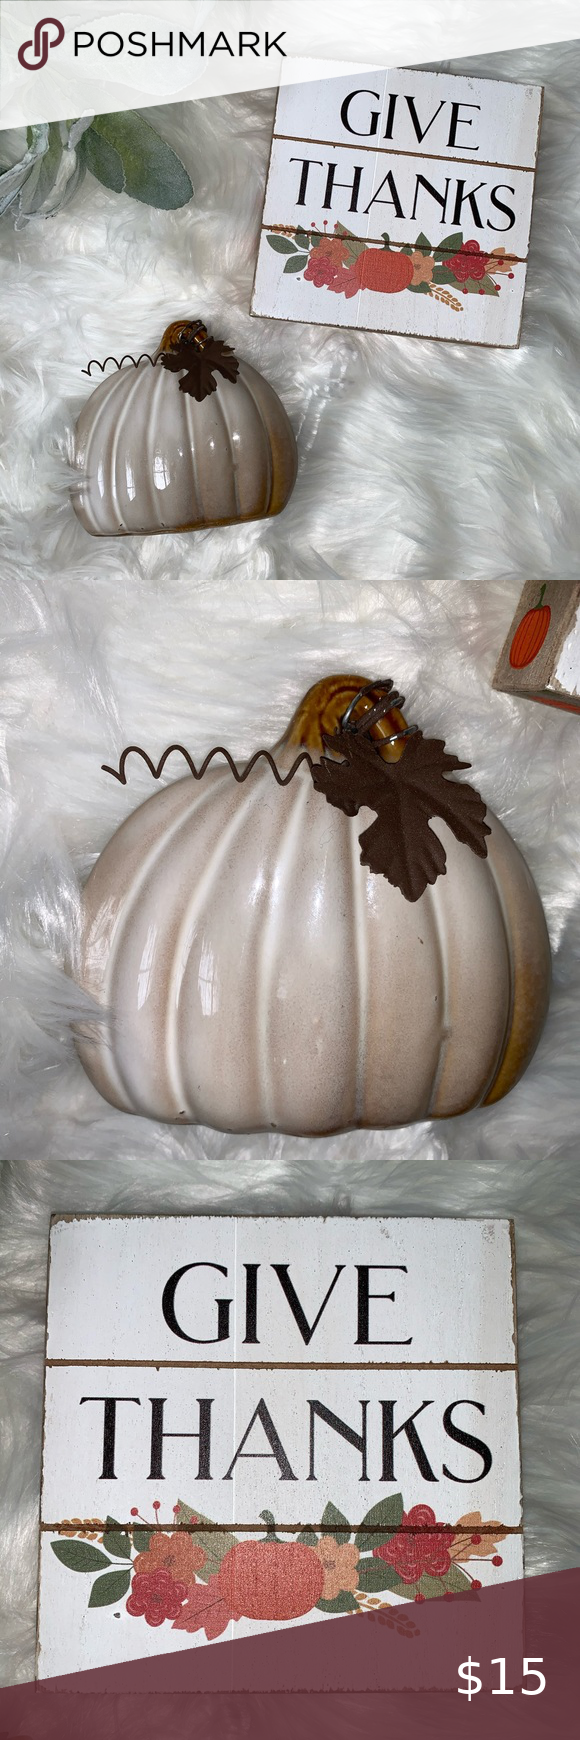 Kohl S Fall Thanksgiving Decor Set In 2020 Fall Thanksgiving Decor Thanksgiving Decorations Fall Thanksgiving